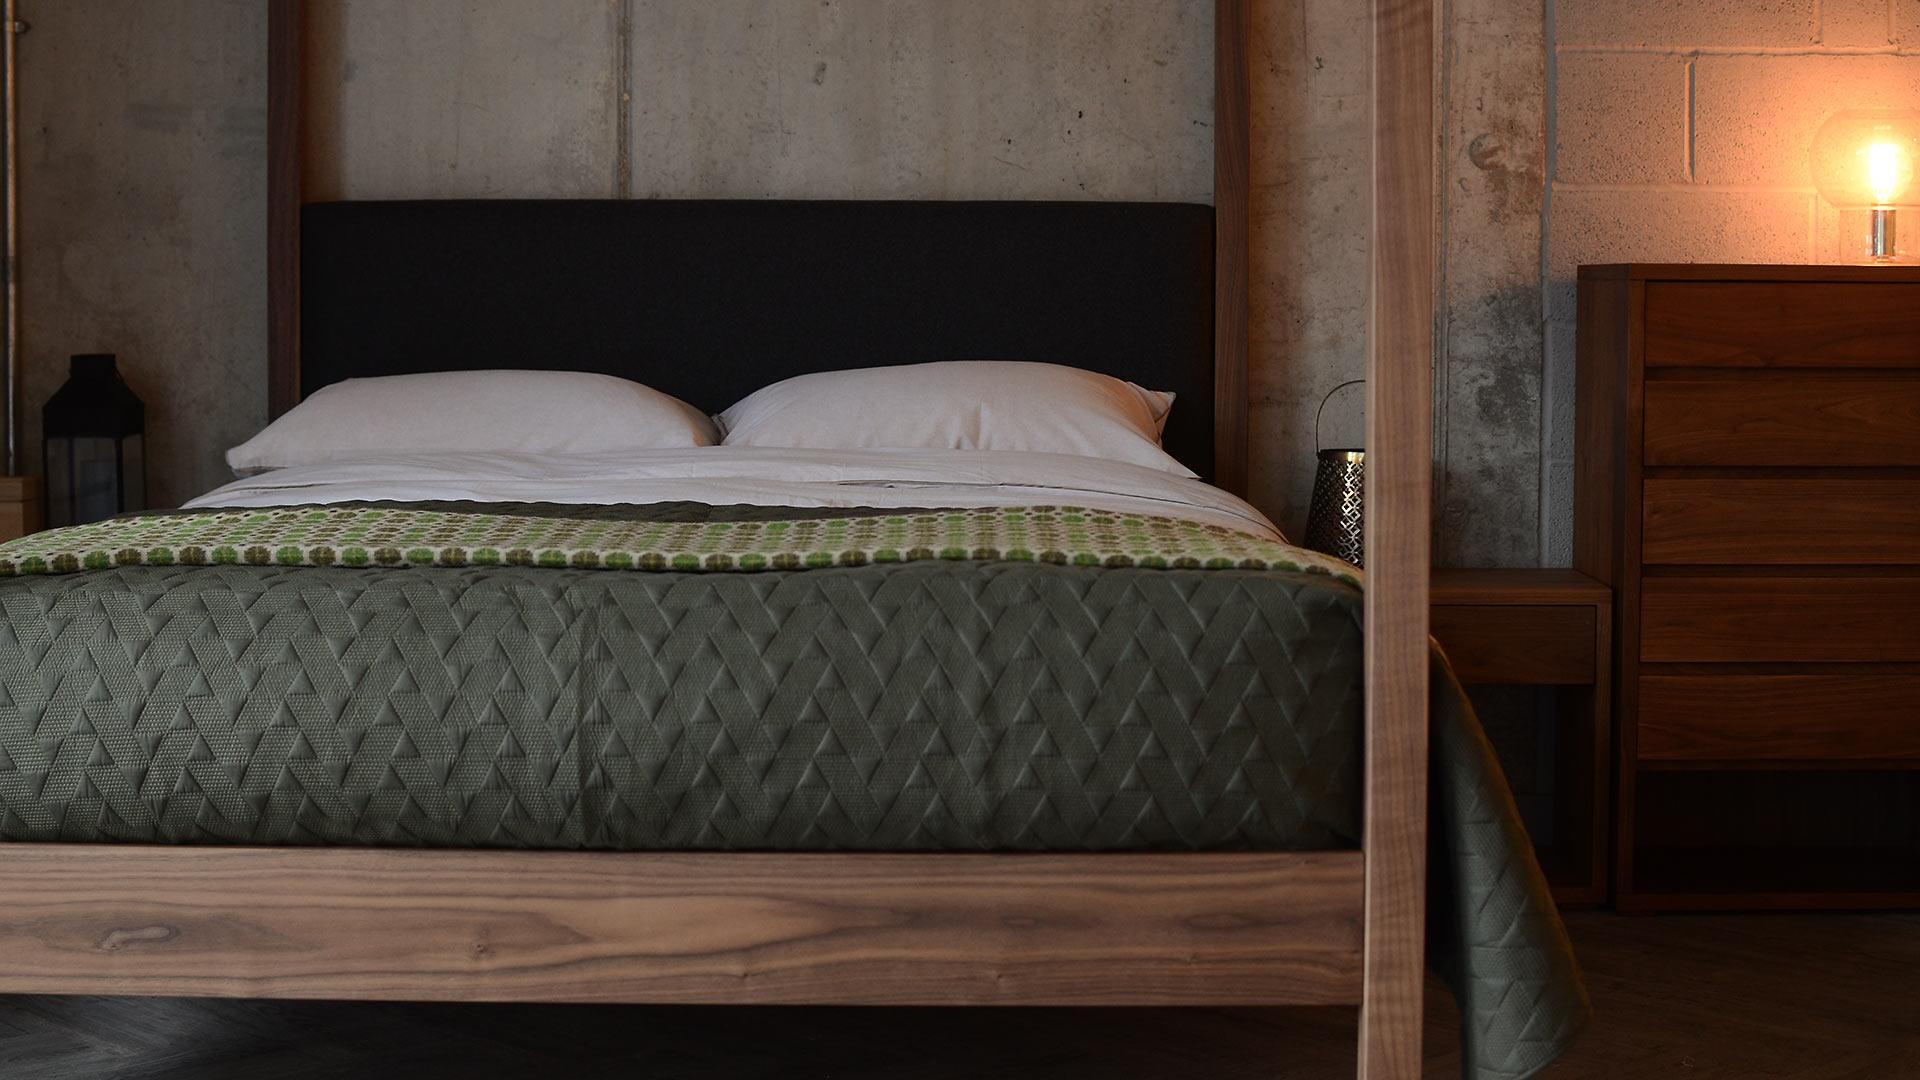 khaki-green-geometric-stich-quilt